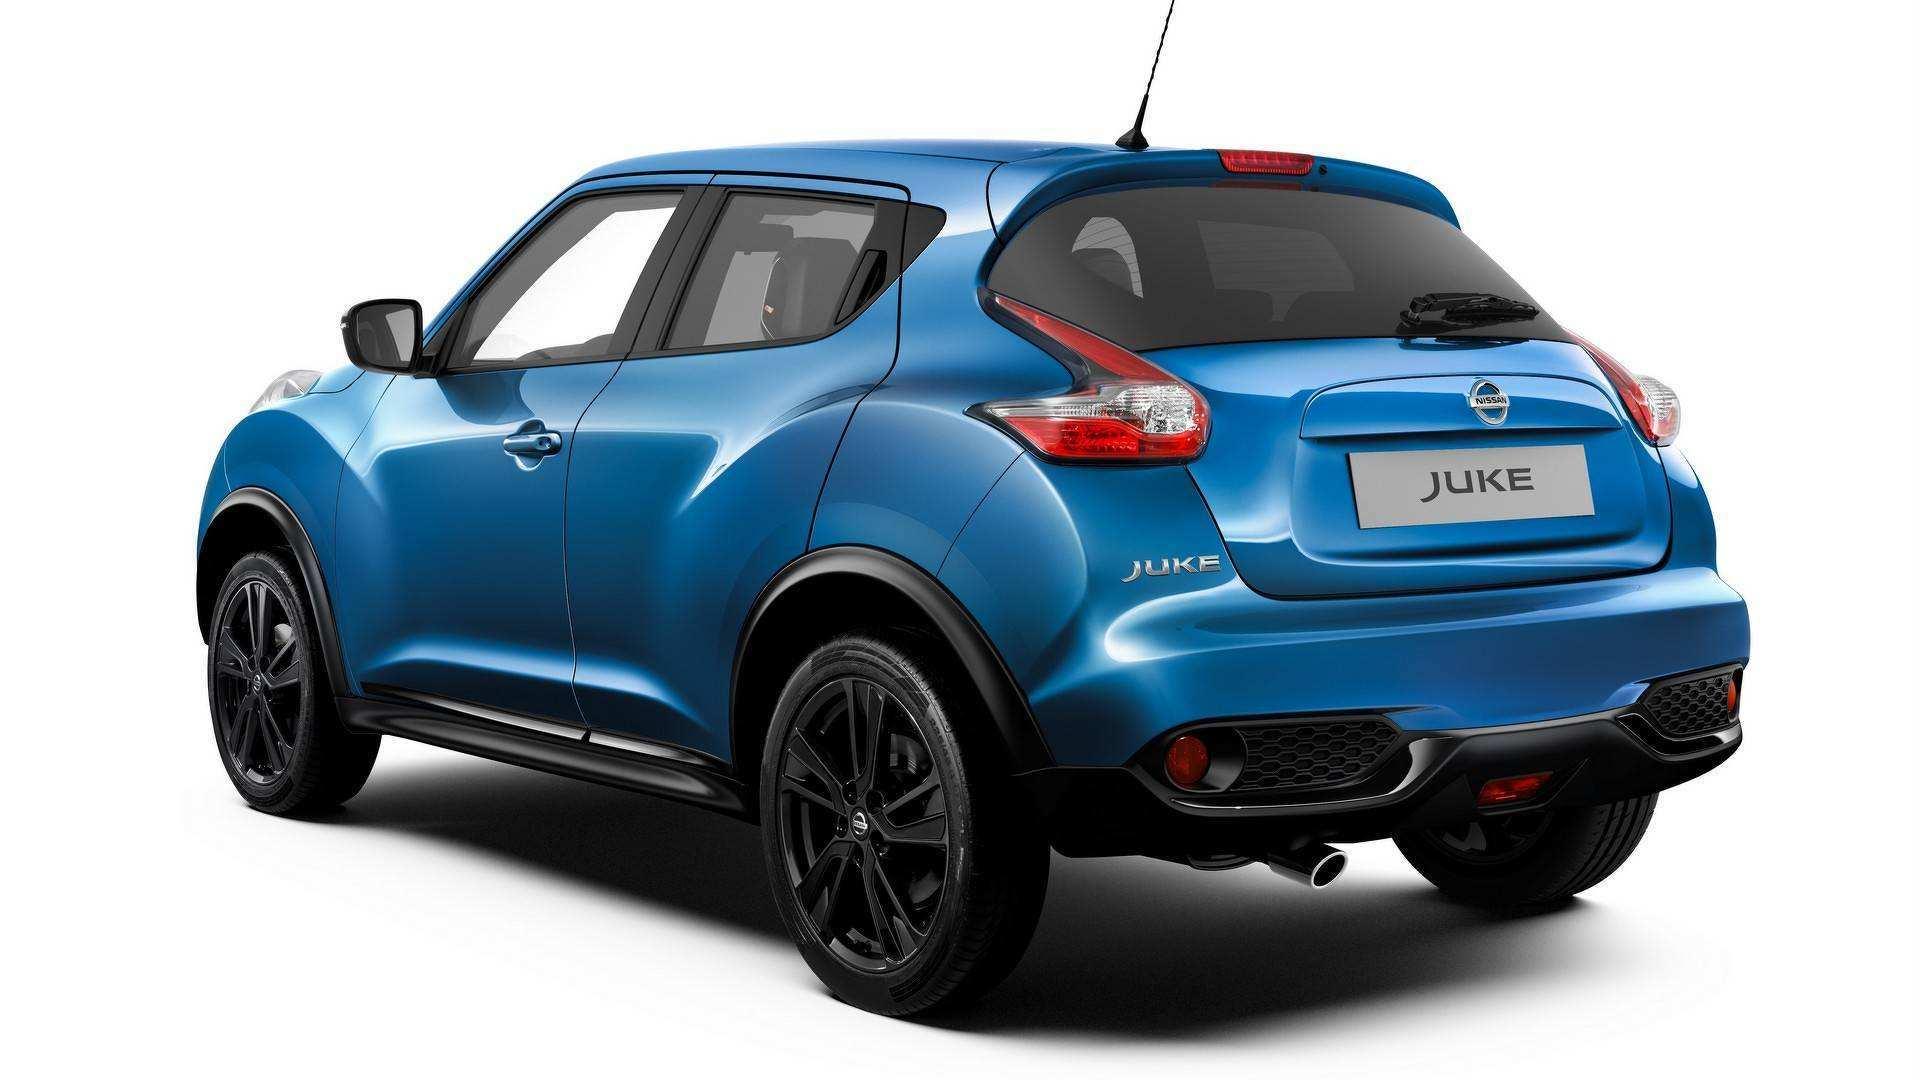 89 Concept of Juke Nissan 2019 Performance for Juke Nissan 2019